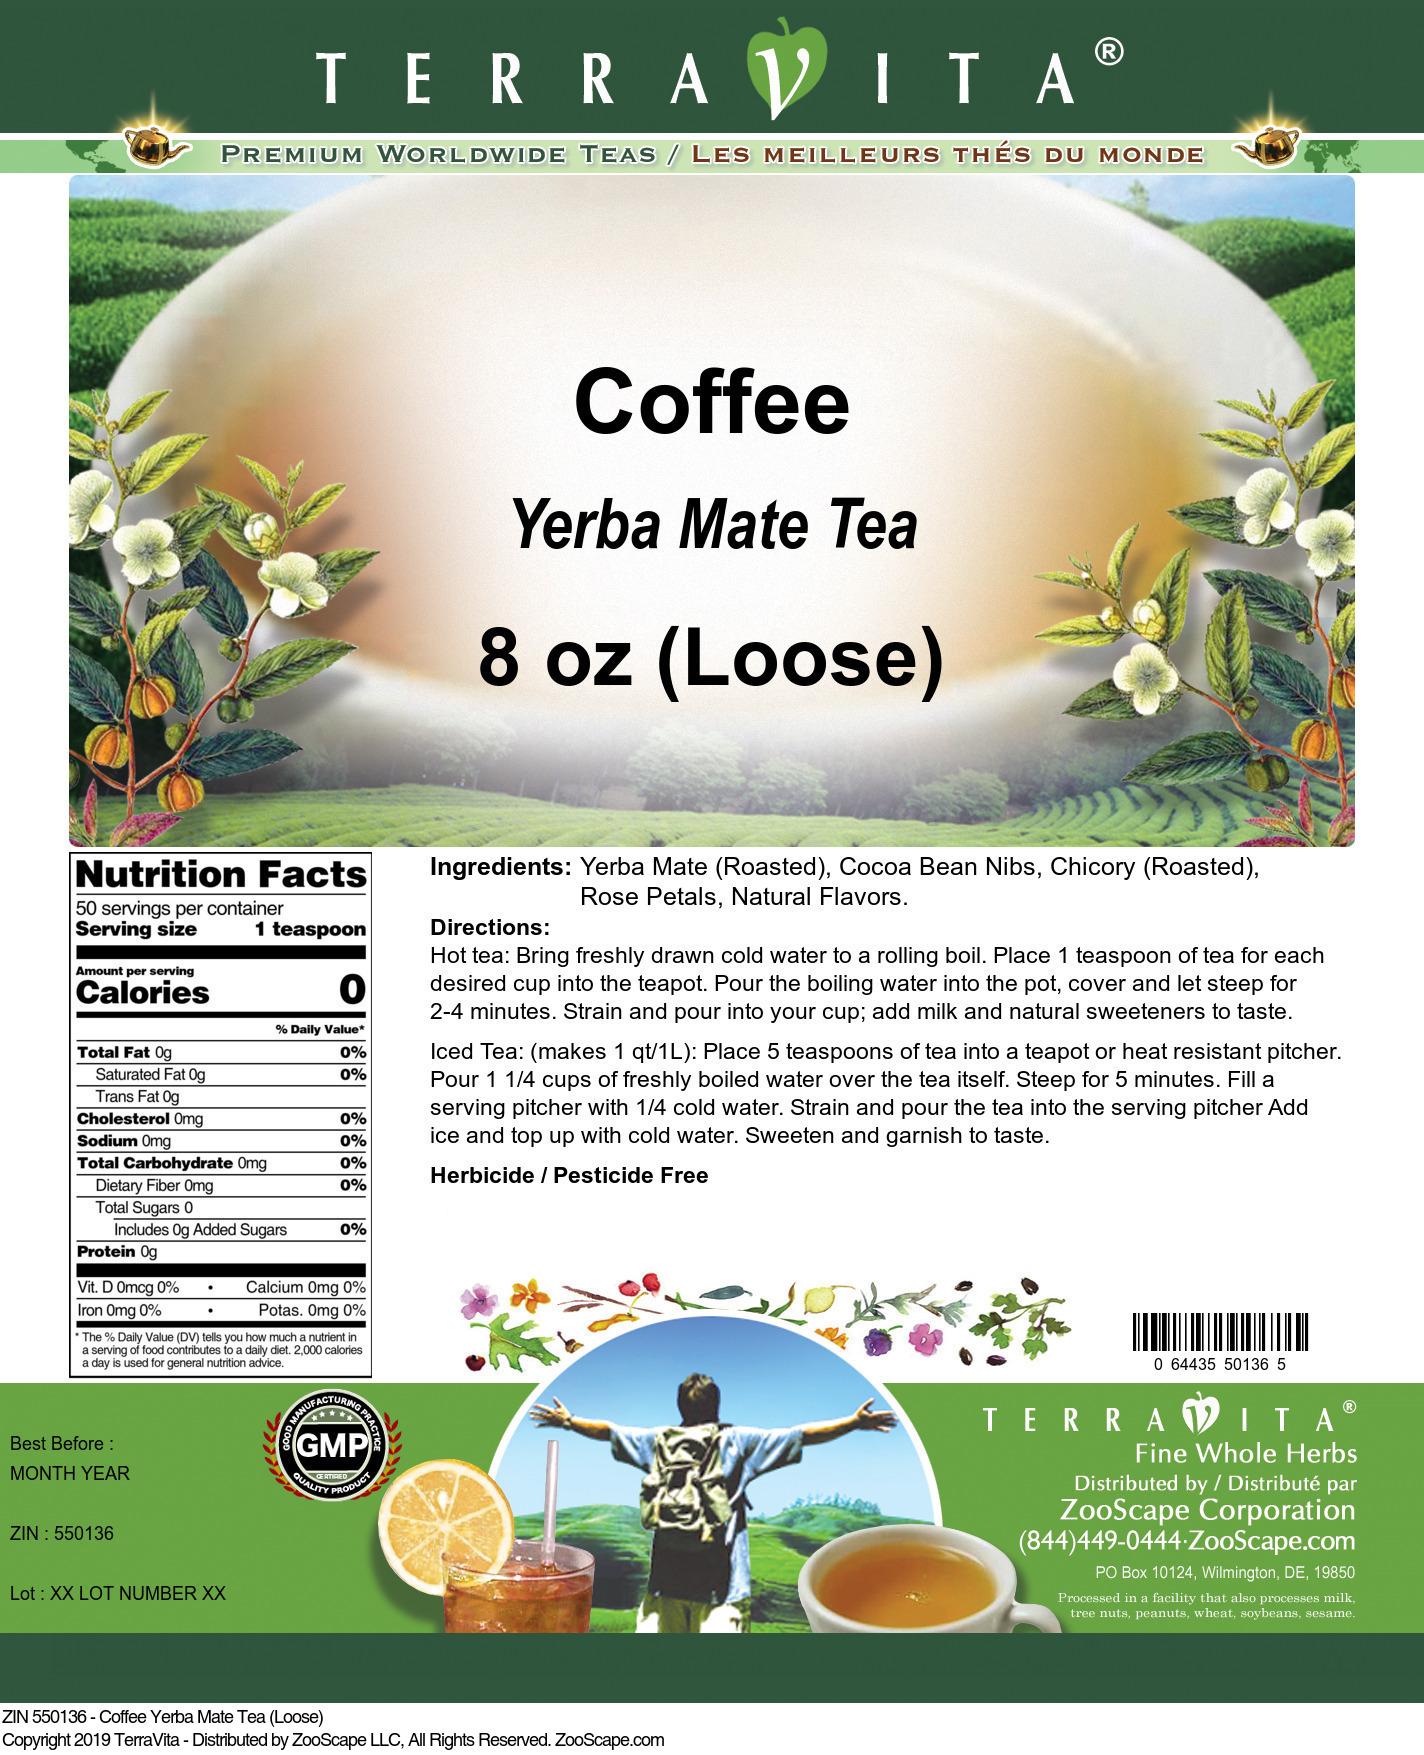 Coffee Yerba Mate Tea (Loose)